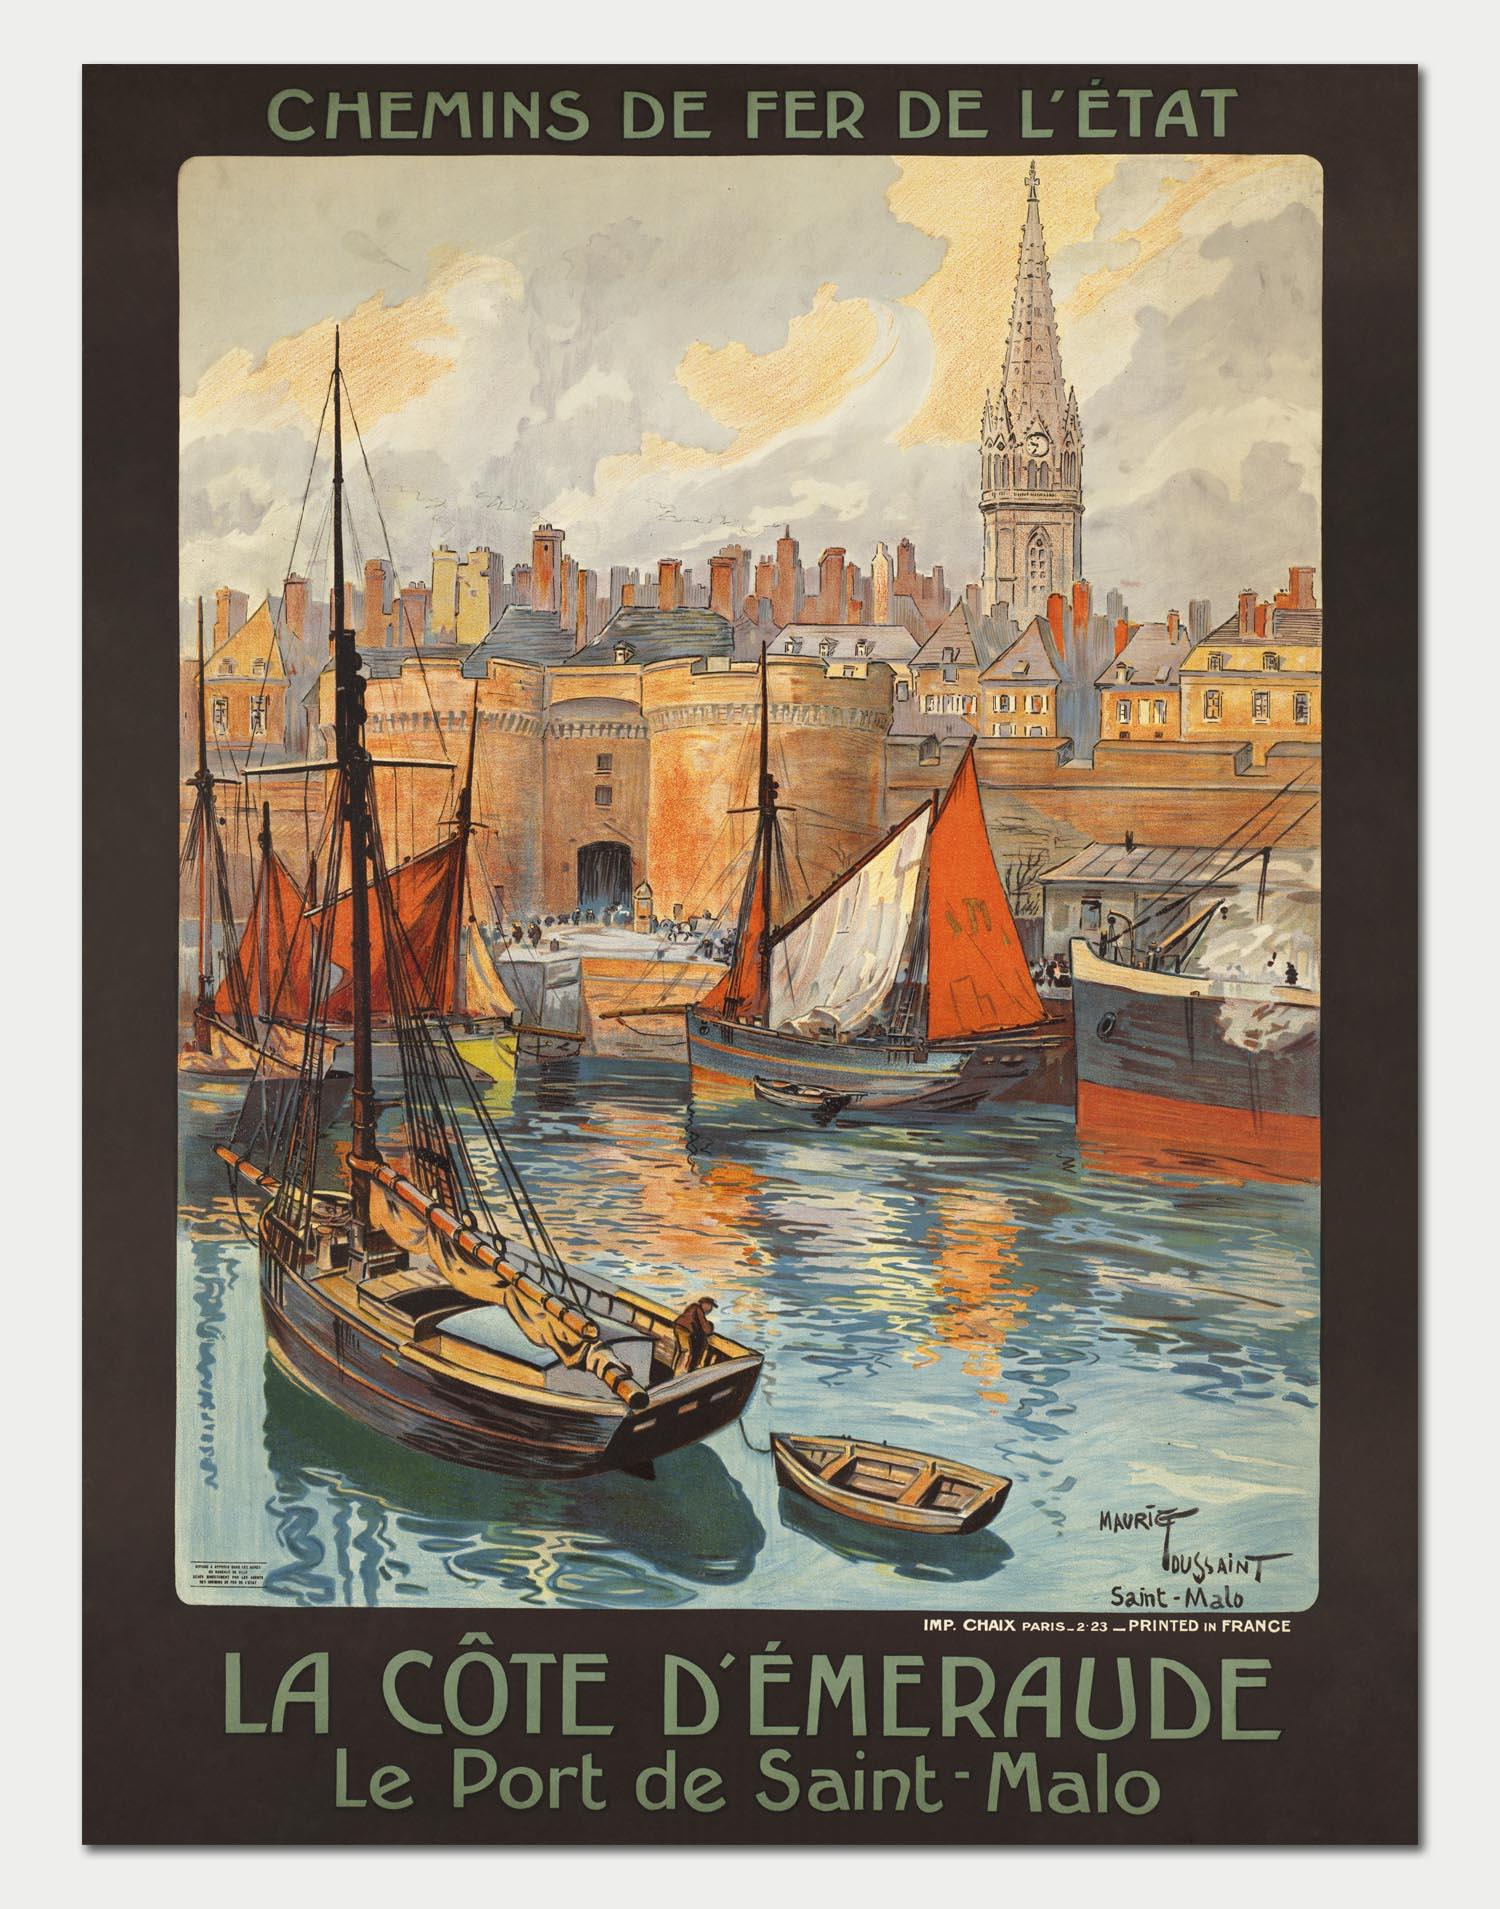 St-Malo 2 Affiche chemin de fer Etat